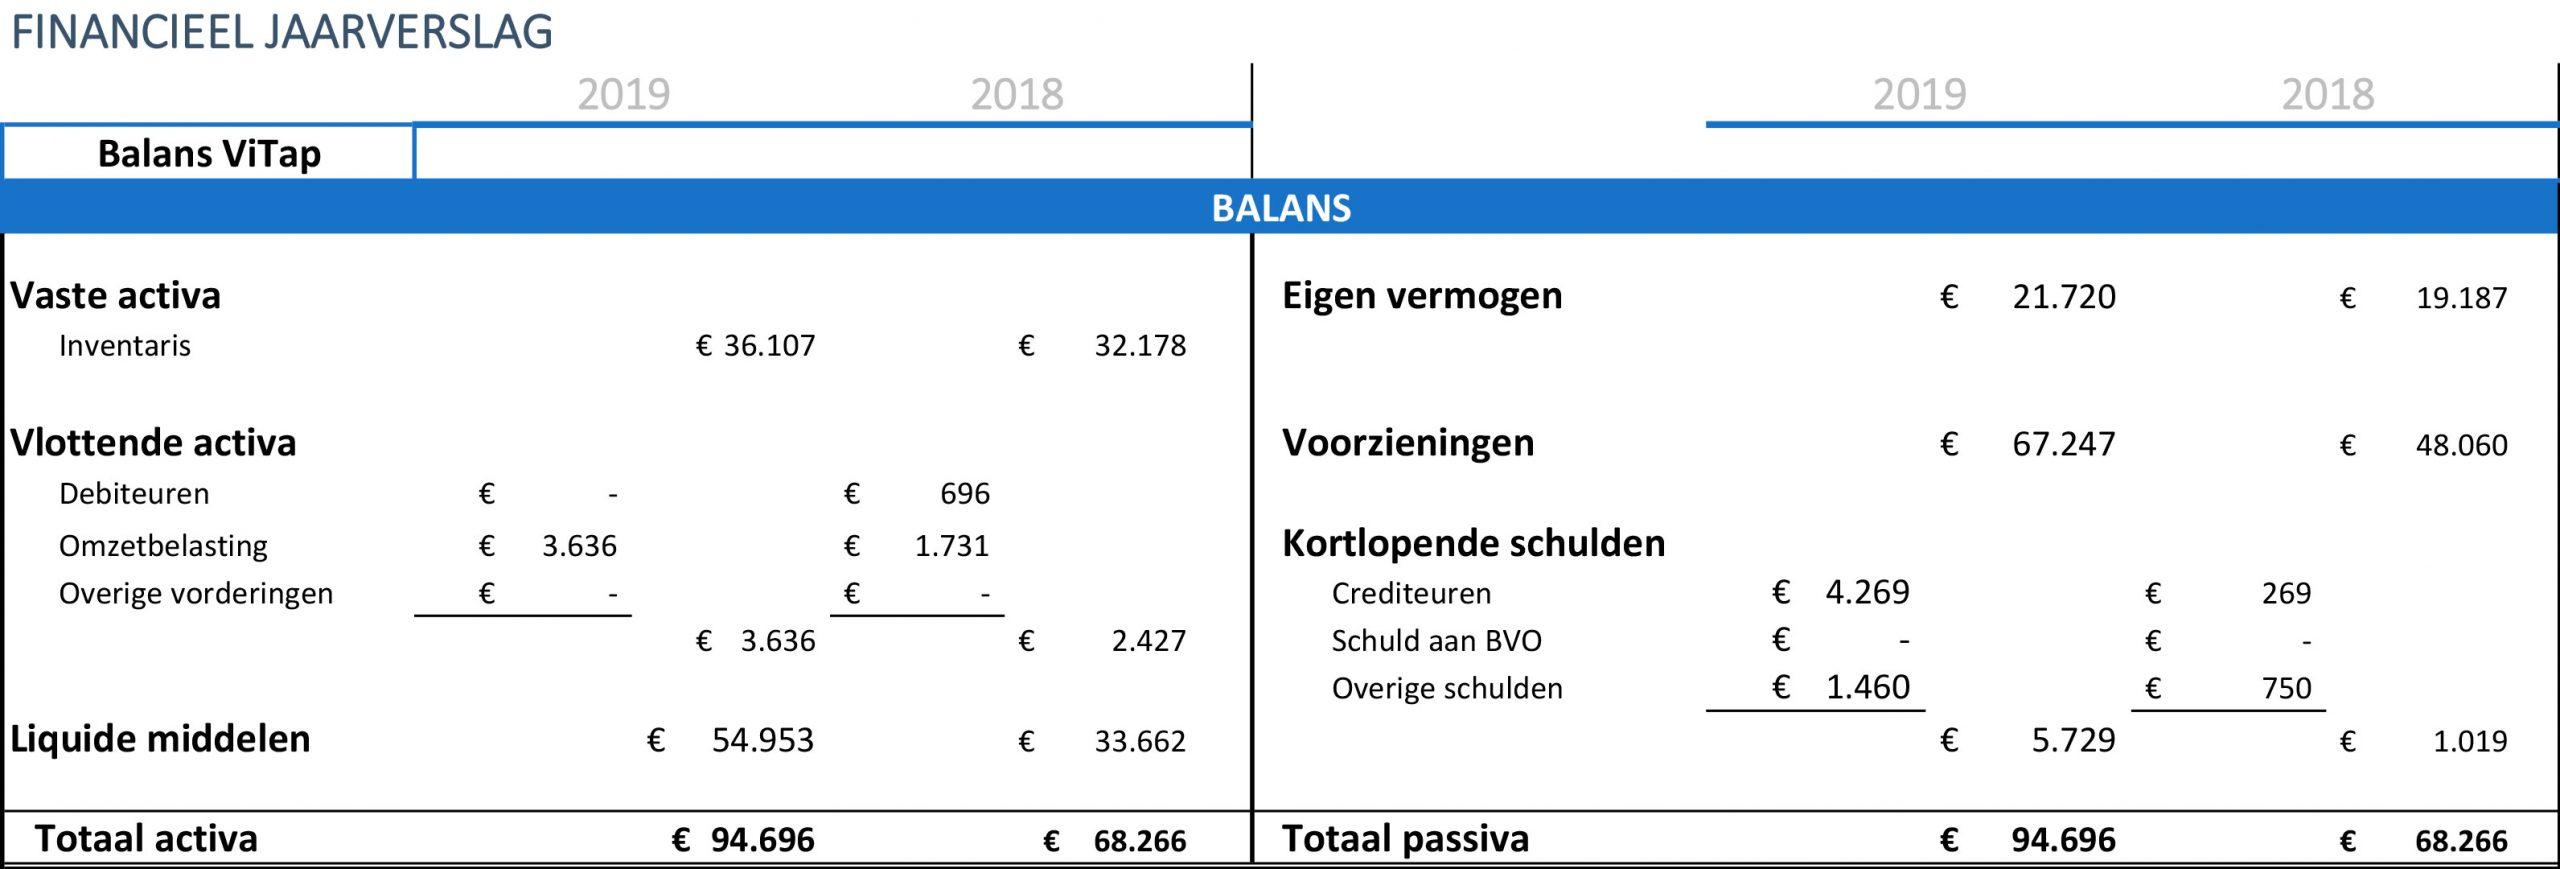 Financieel jaarverslag ViTap Balans 2019 scaled